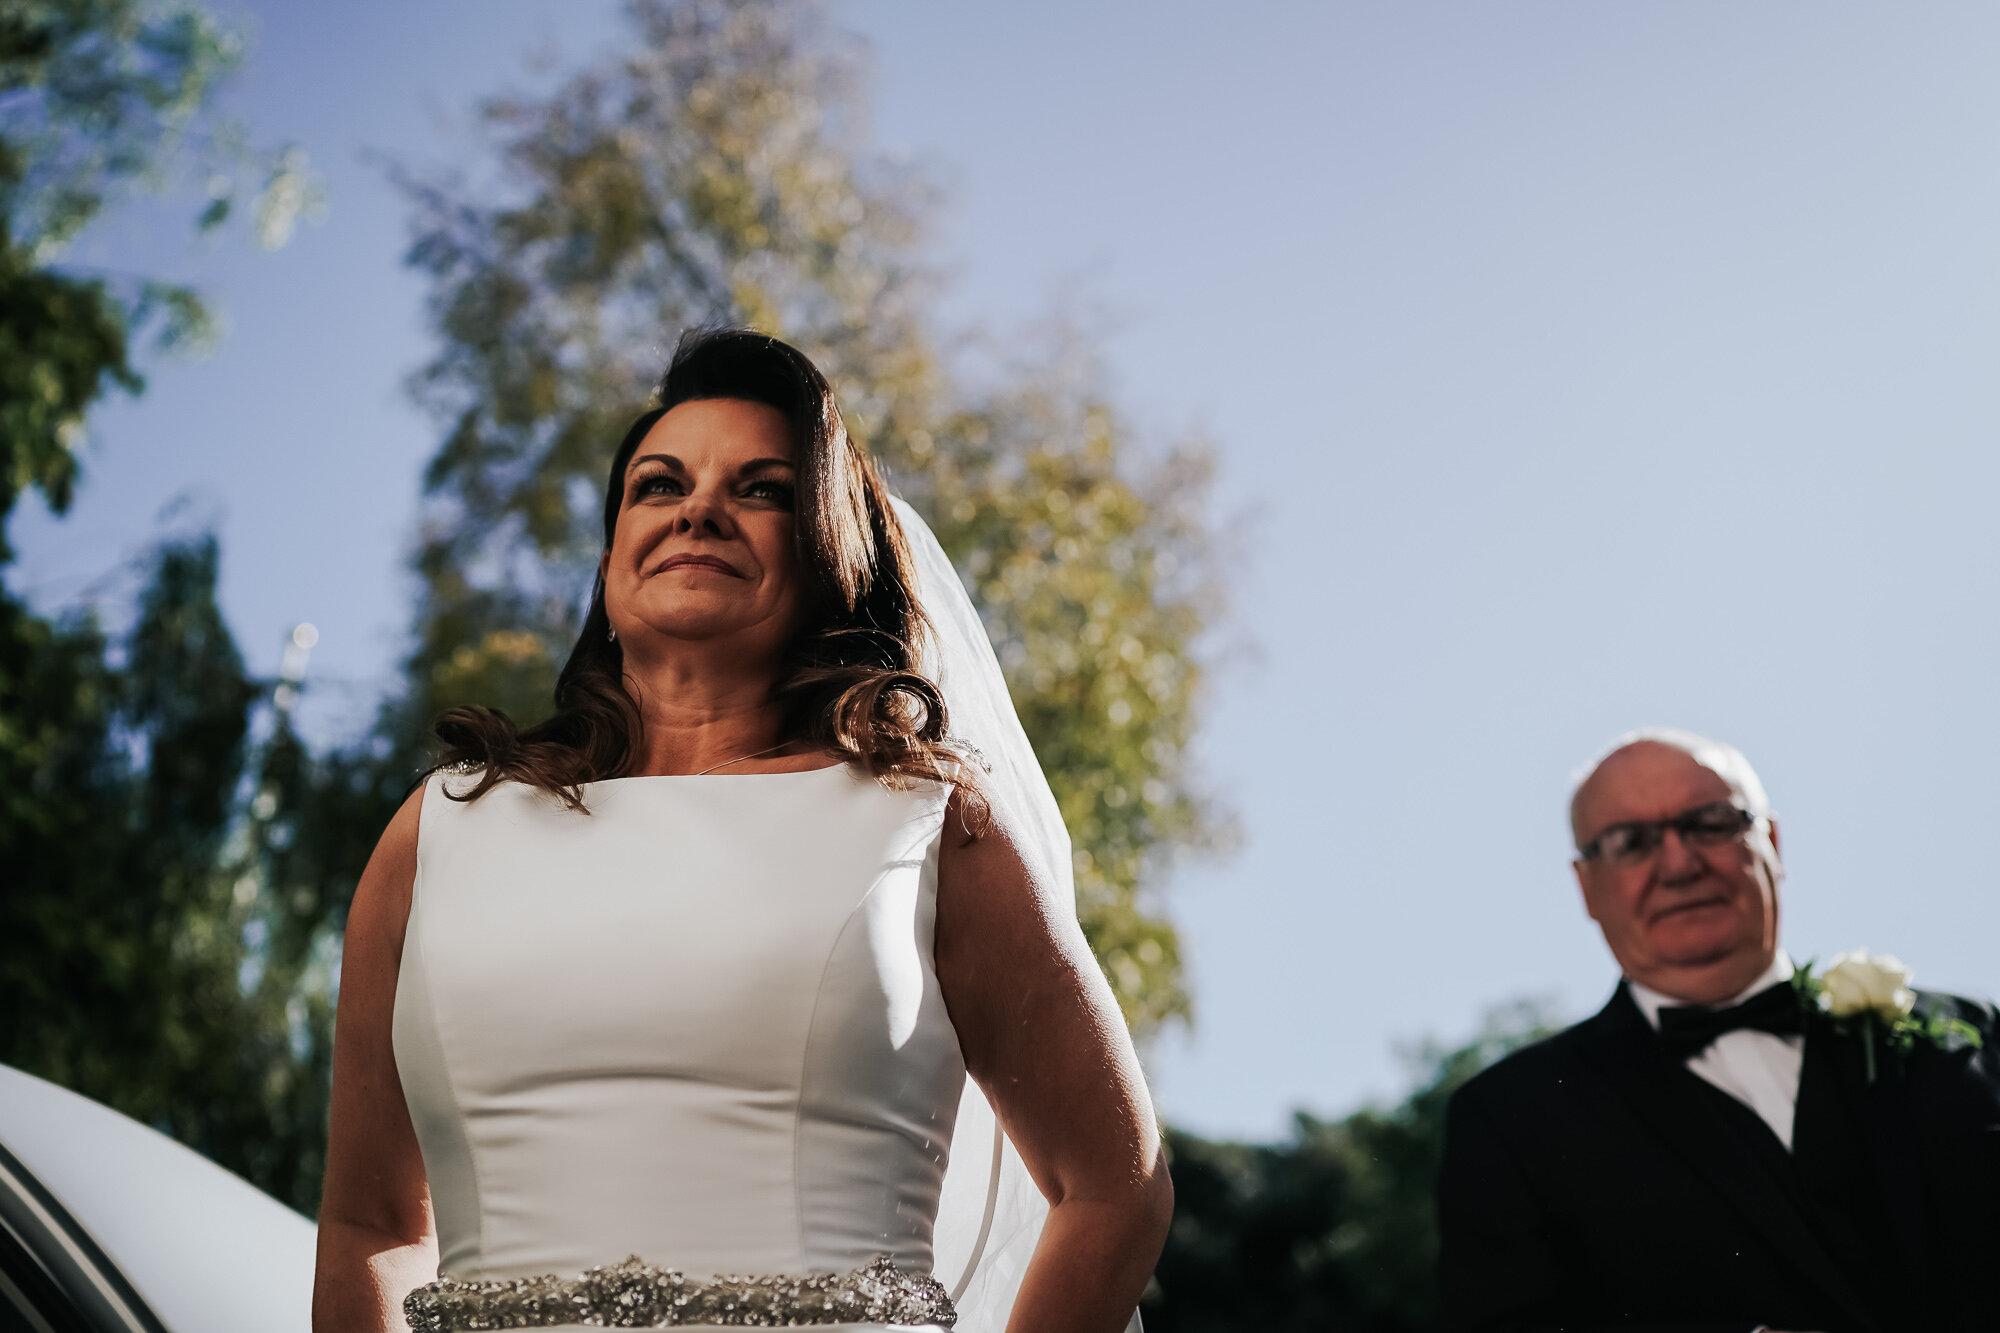 Clontarf Caste wedding photographer Wedding Photography dublin ireland wedding photographer (18 of 58).jpg